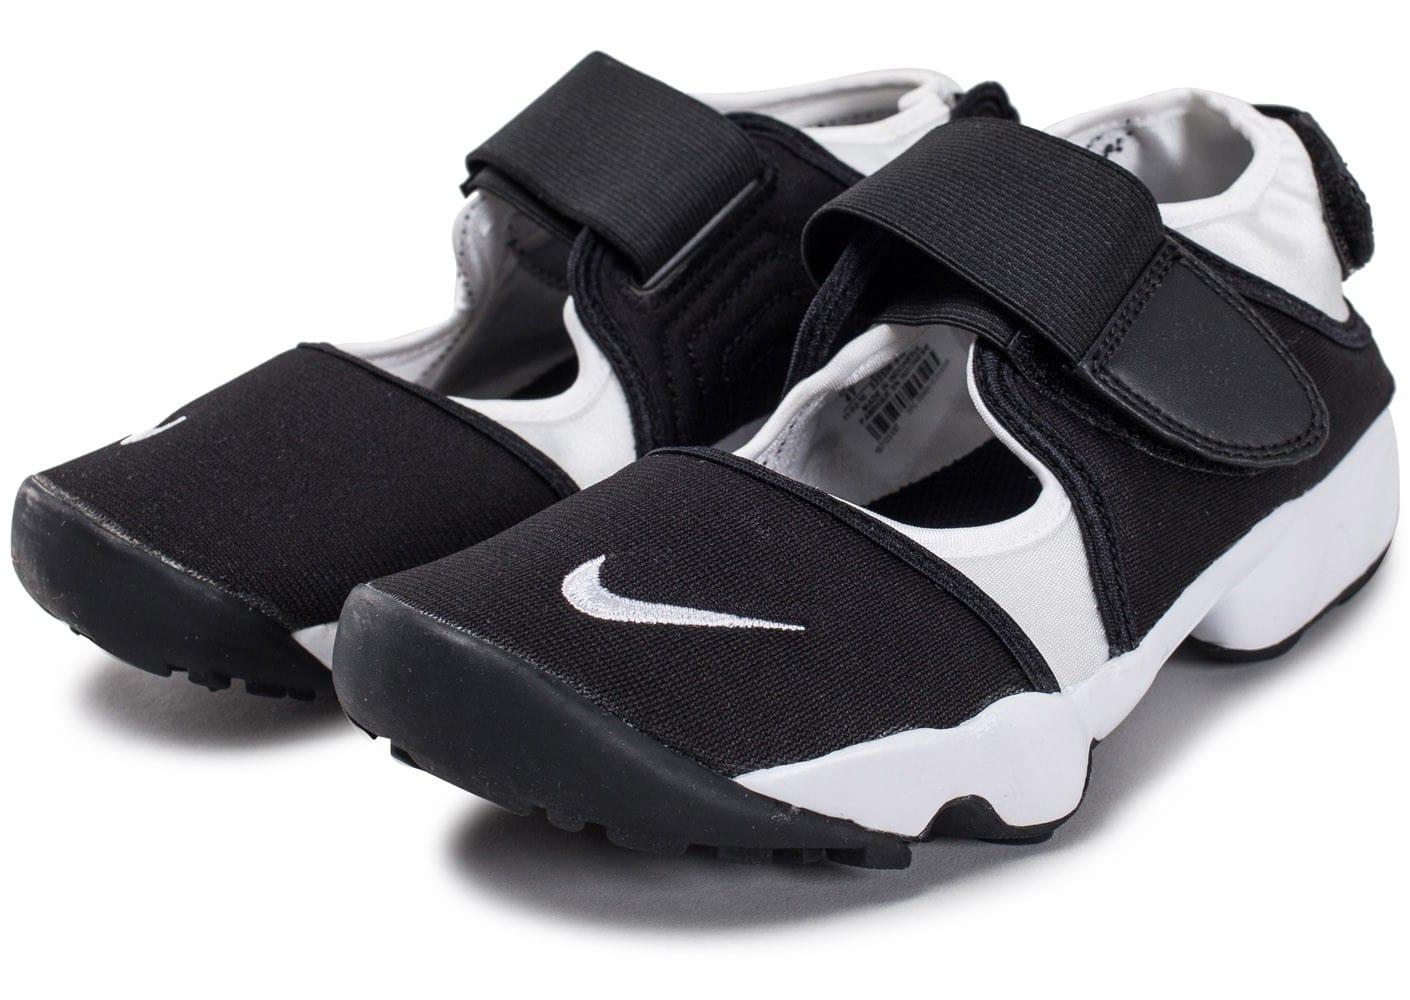 Soldes > chaussure nike ouverte > en stock